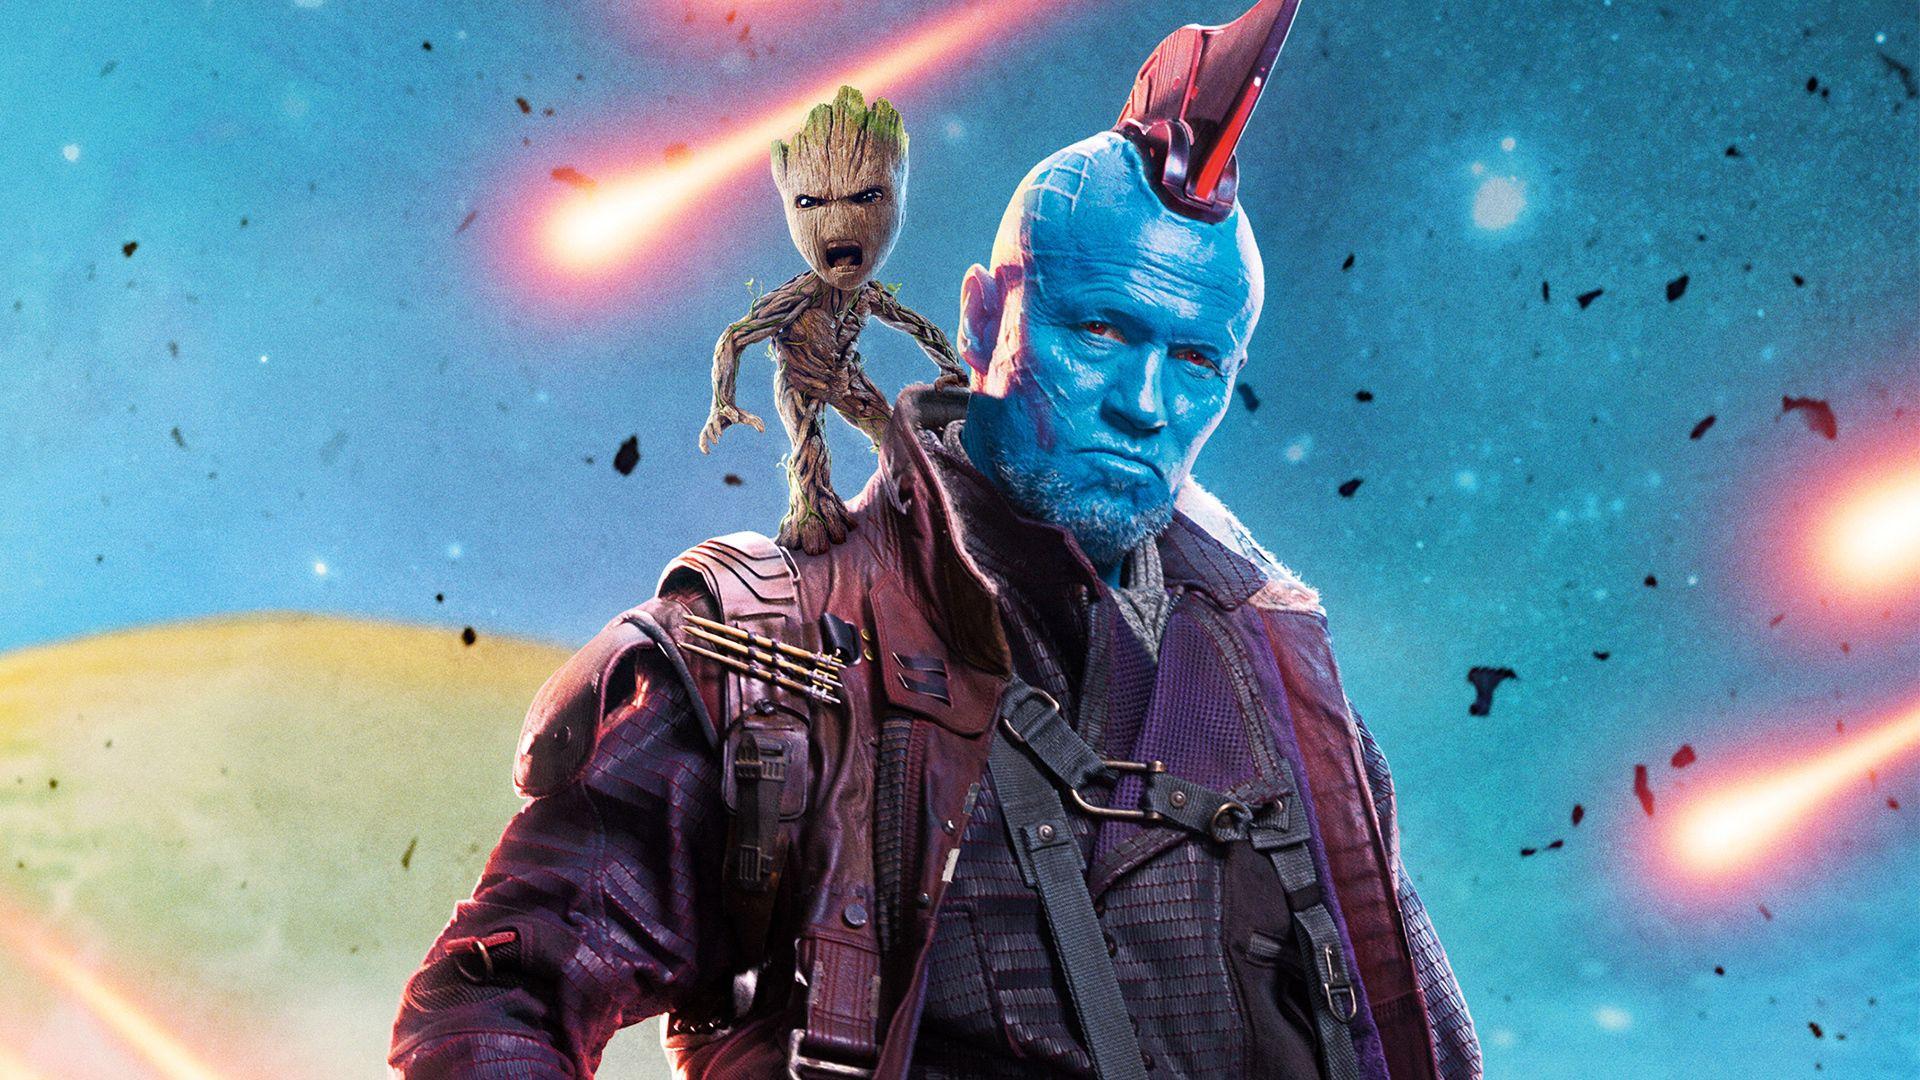 Guardiani della galassia yondu i ravagers david bowie